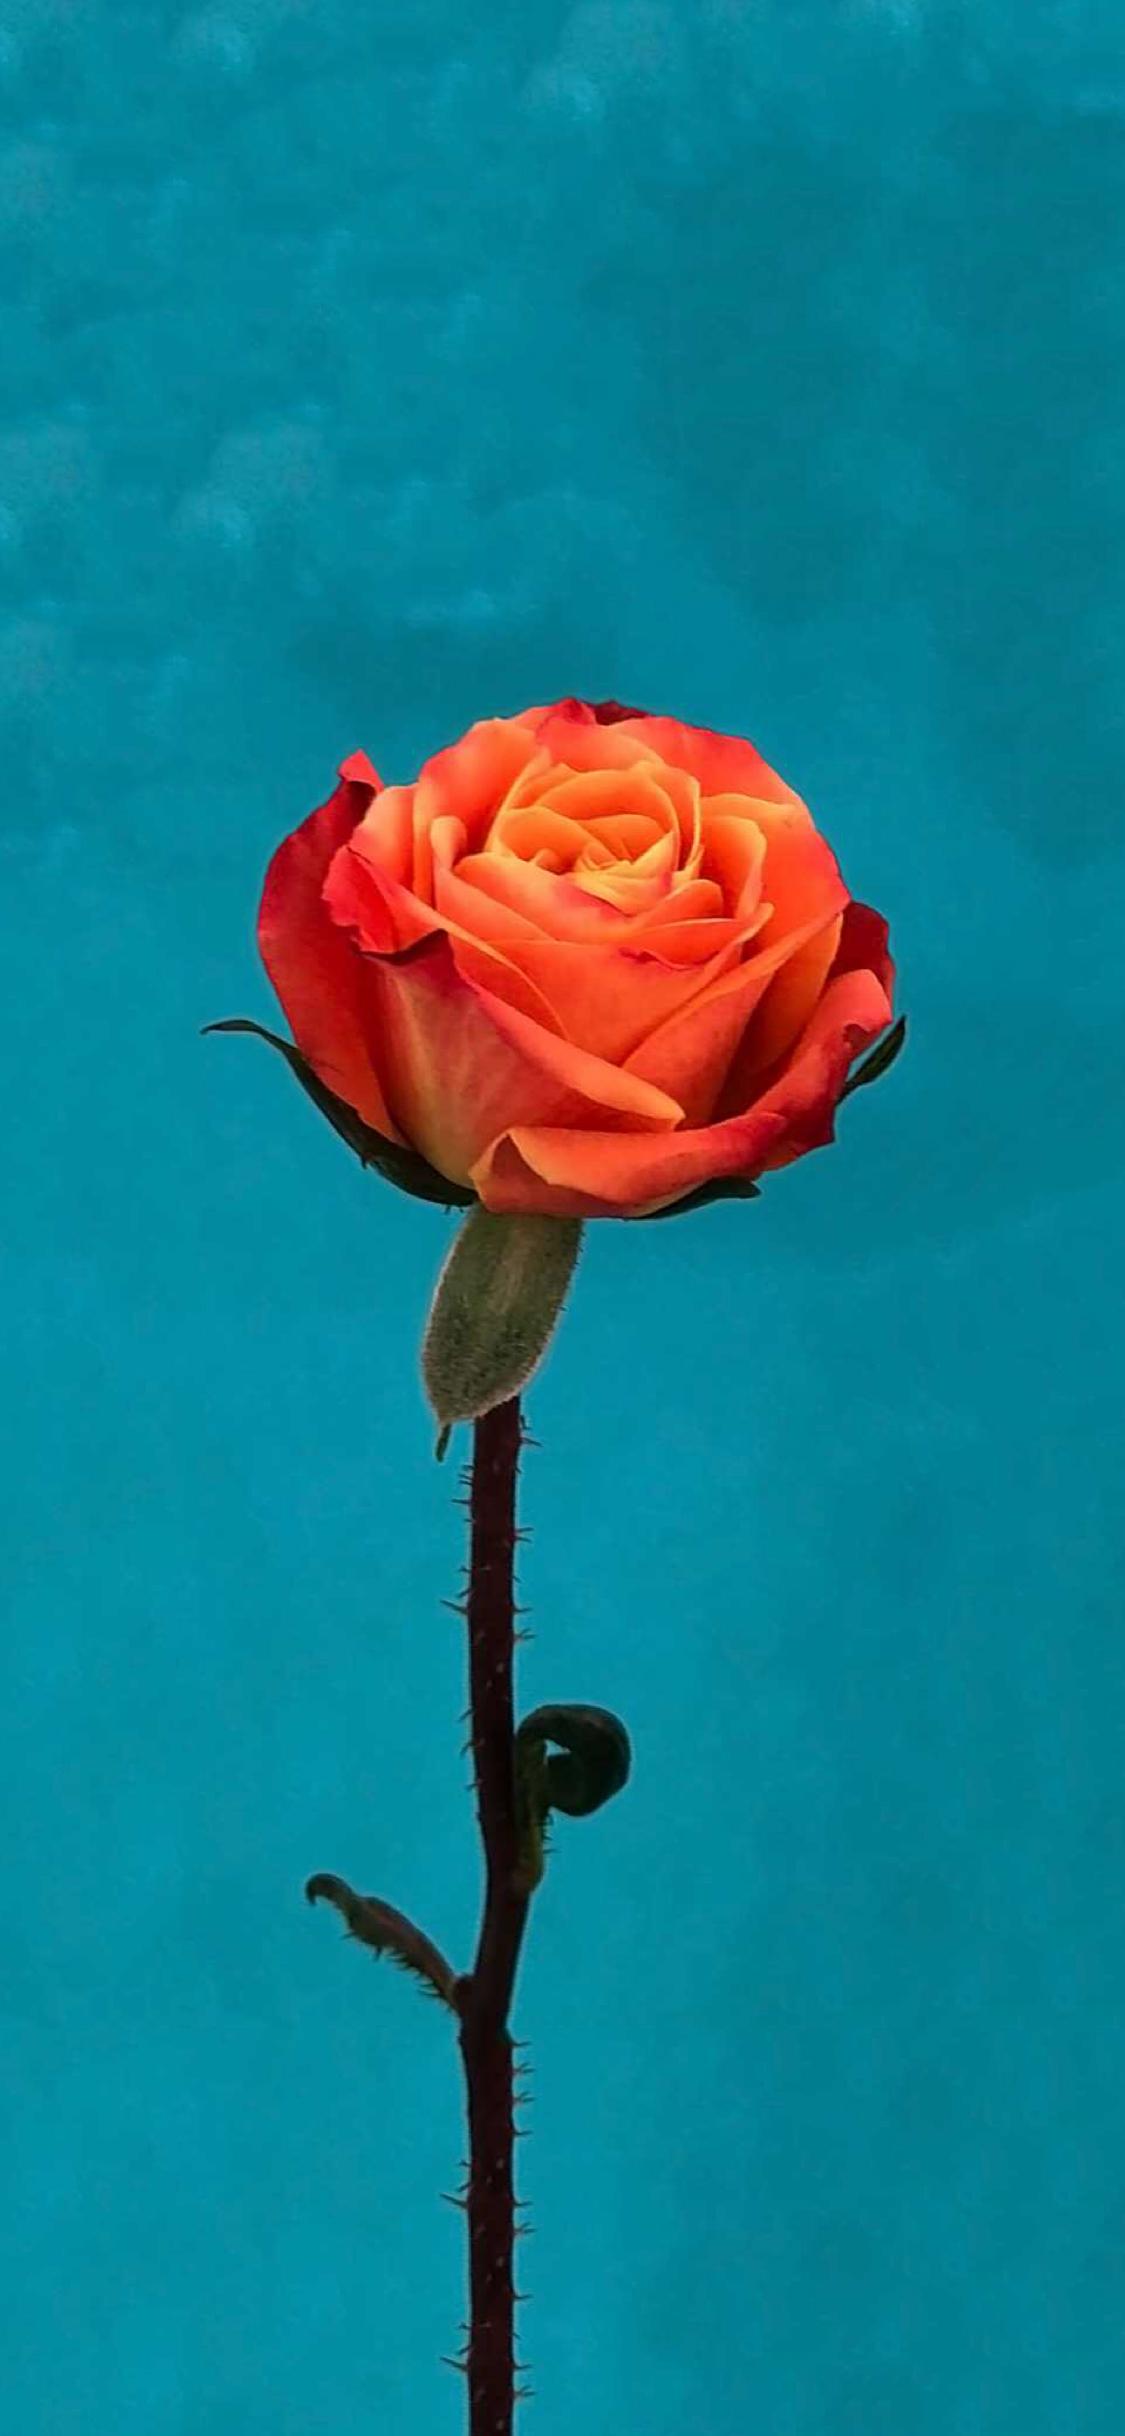 Ios 11 Orange Rose Wallpaper Rose Flower Wallpaper Iphone